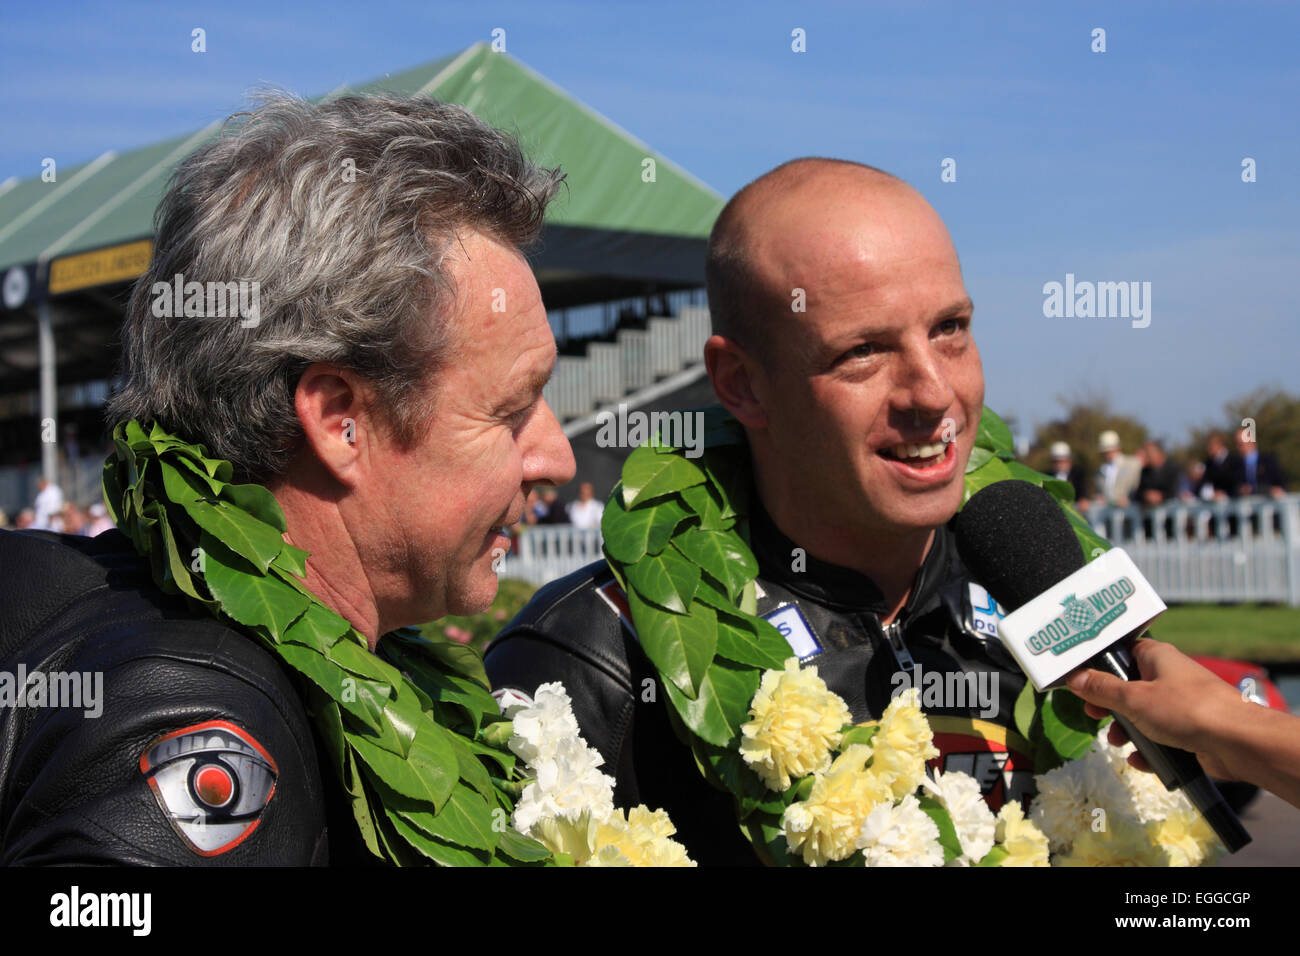 Ehemalige 500ccm Welt Weltmeister Wayne Gardner (links) & Mark Sharrock nach dem Gewinn der Barry Sheene Memorial Stockbild